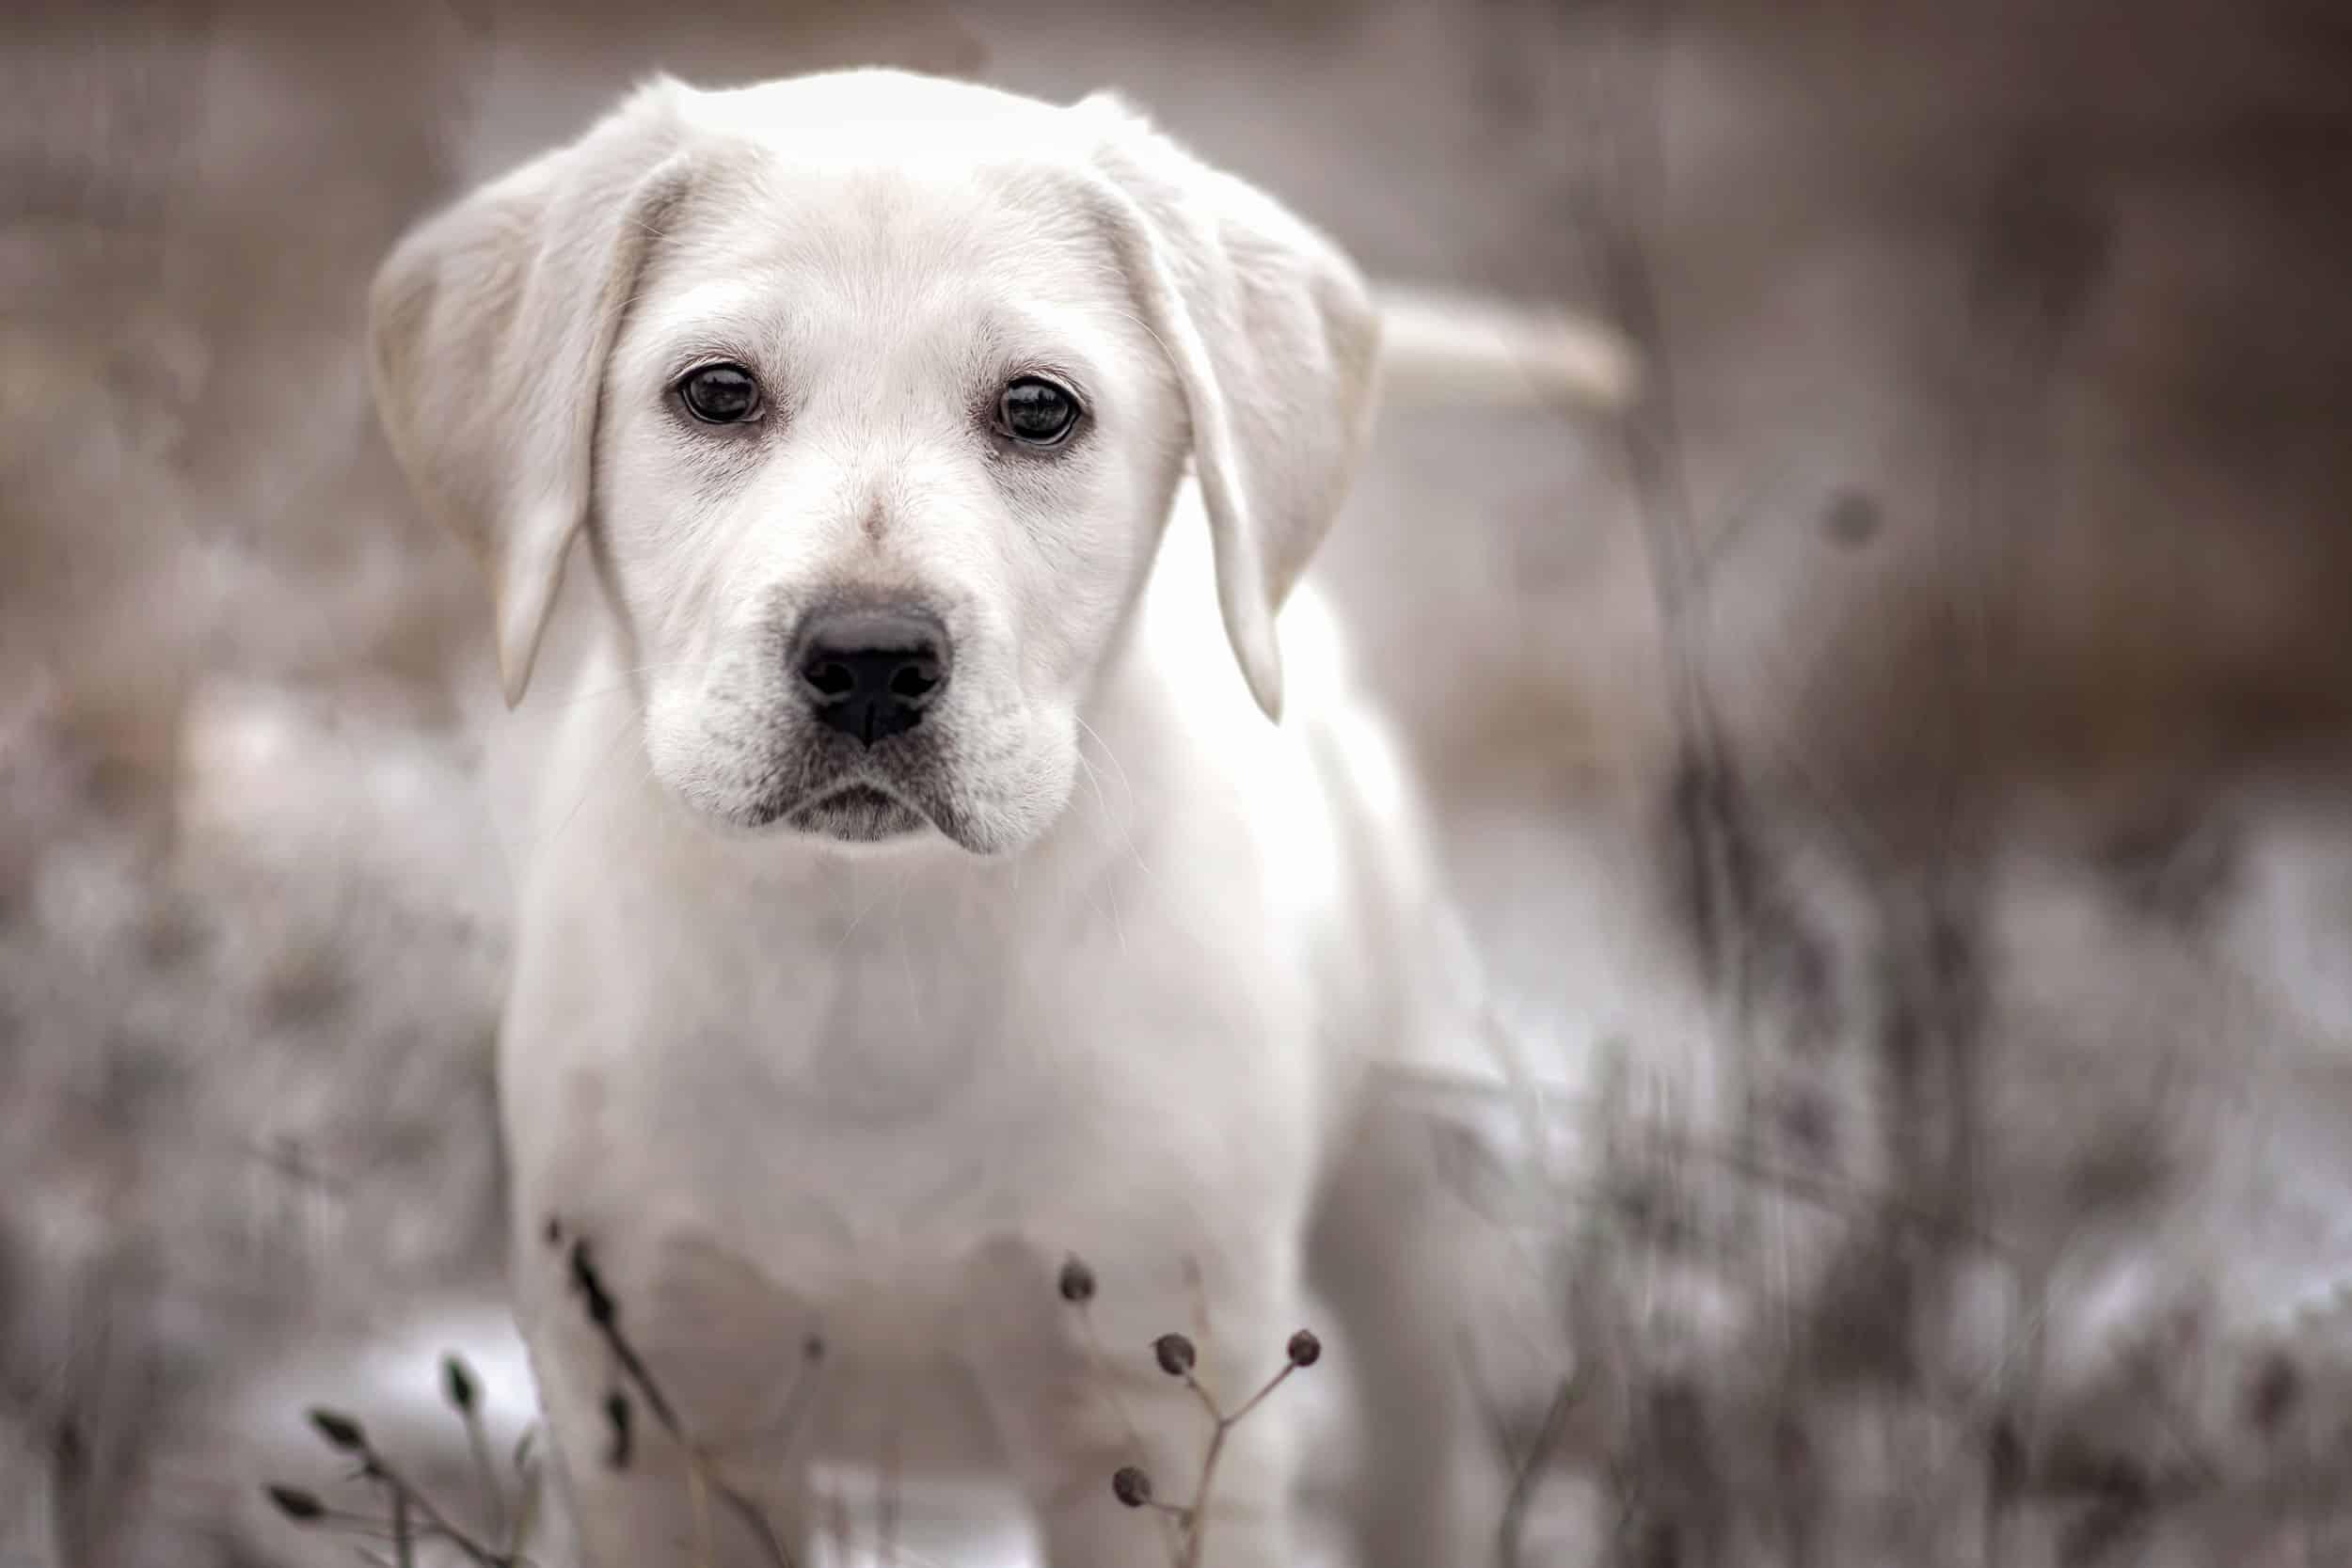 Twyla-megaesophagus-rescue-dogs-in-Idaho